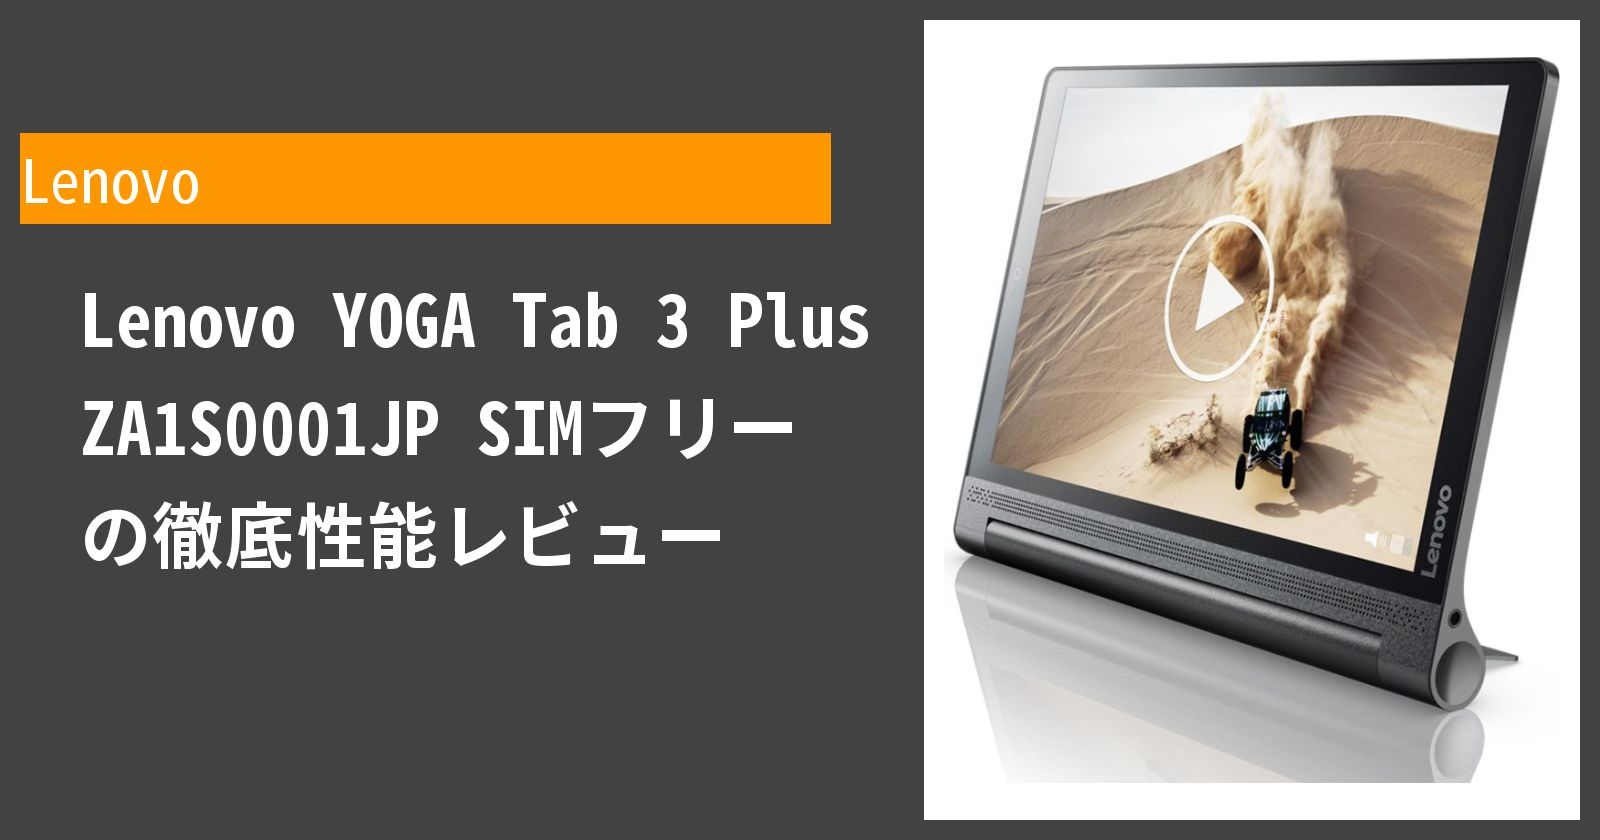 YOGA Tab 3 Plus ZA1S0001JP の徹底性能レビュー